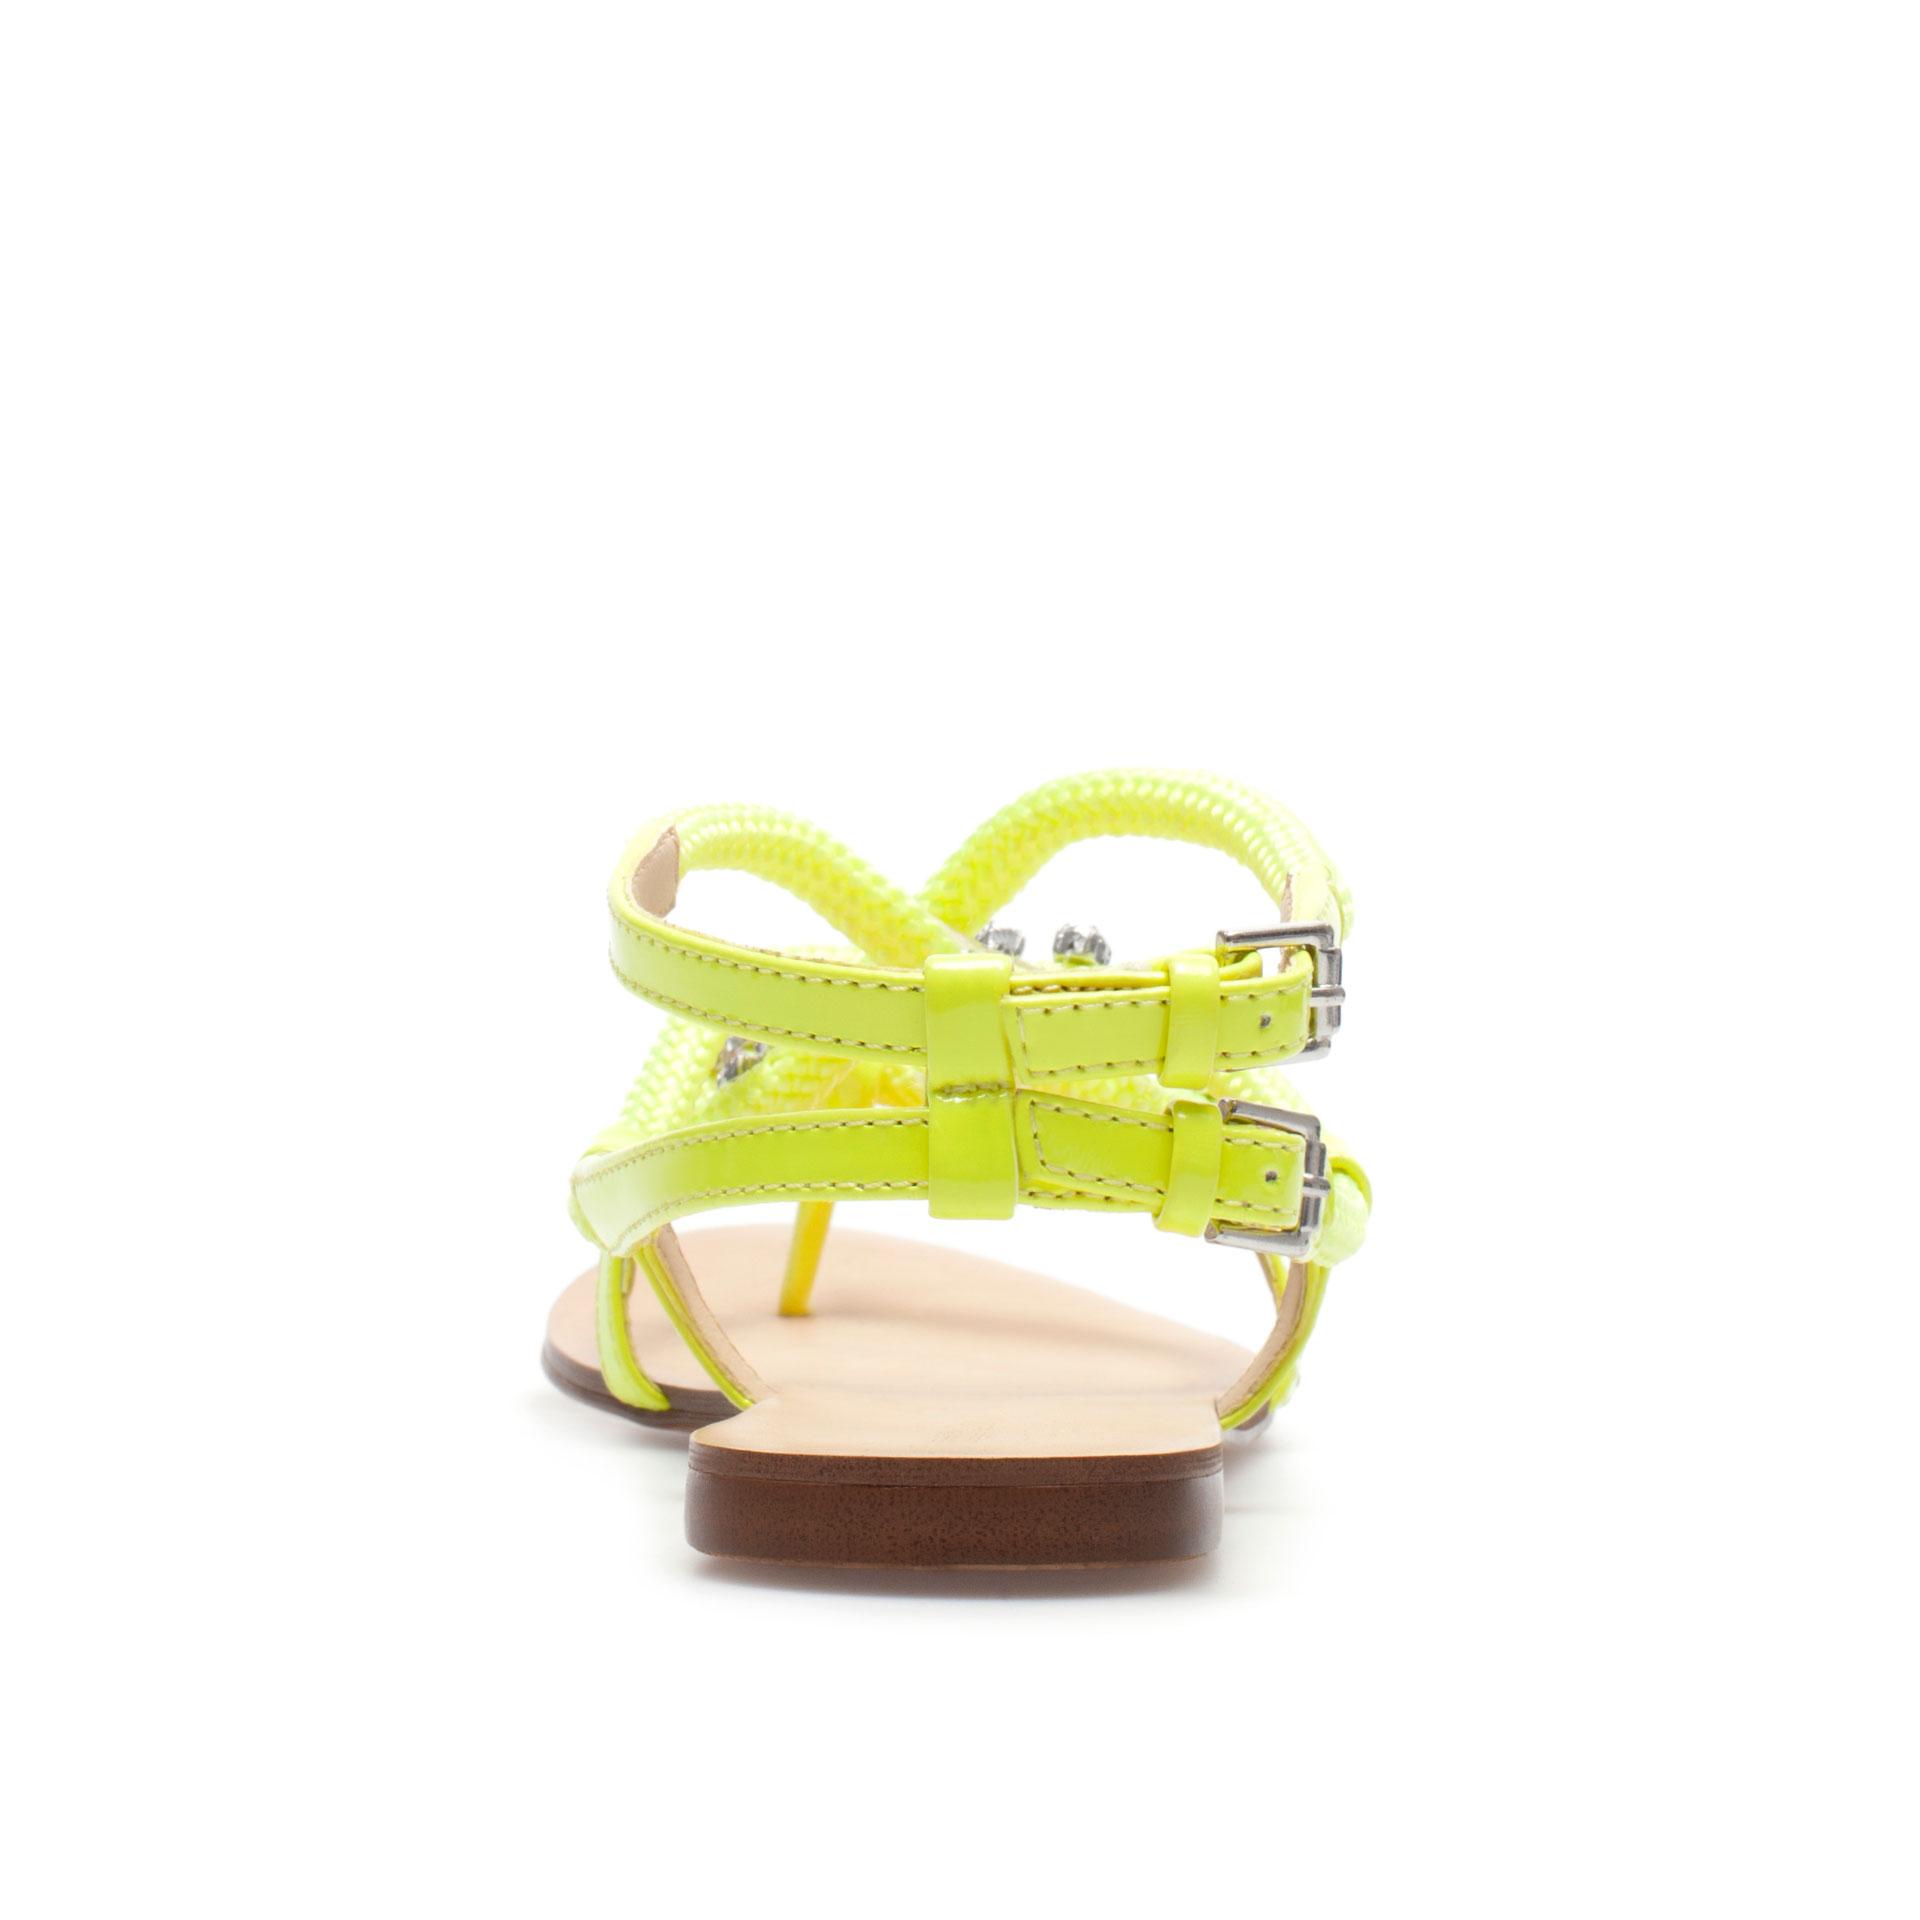 Zara Neon Strappy Sandal in Yellow   Lyst